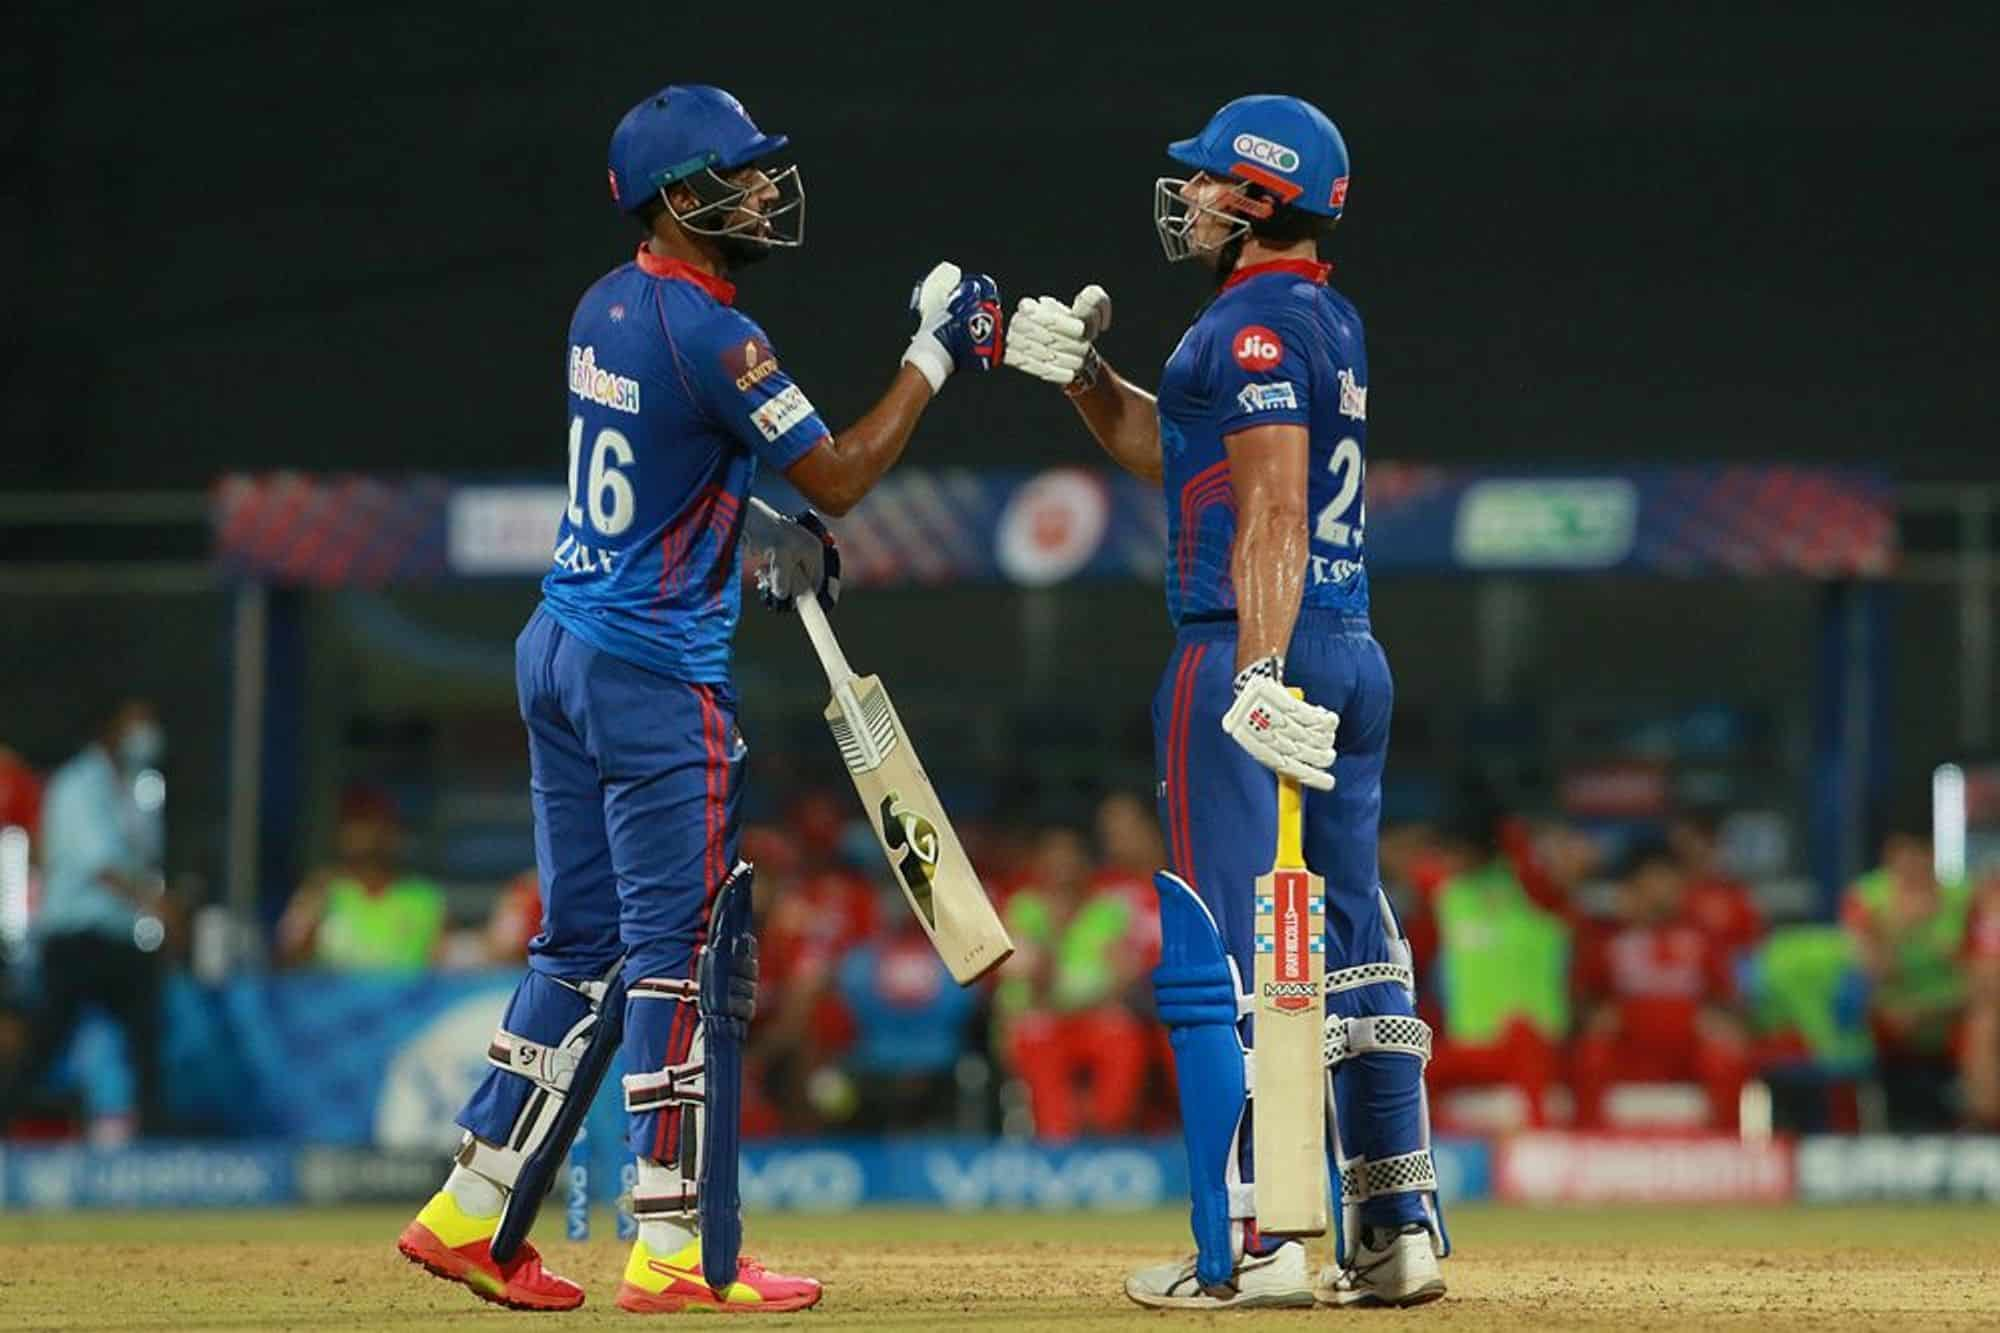 DC vs PBKS Twitter Reactions: Shikhar Dhawan's 92 Guides Delhi Capitals To Six-Wicket Win Over Punjab Kings